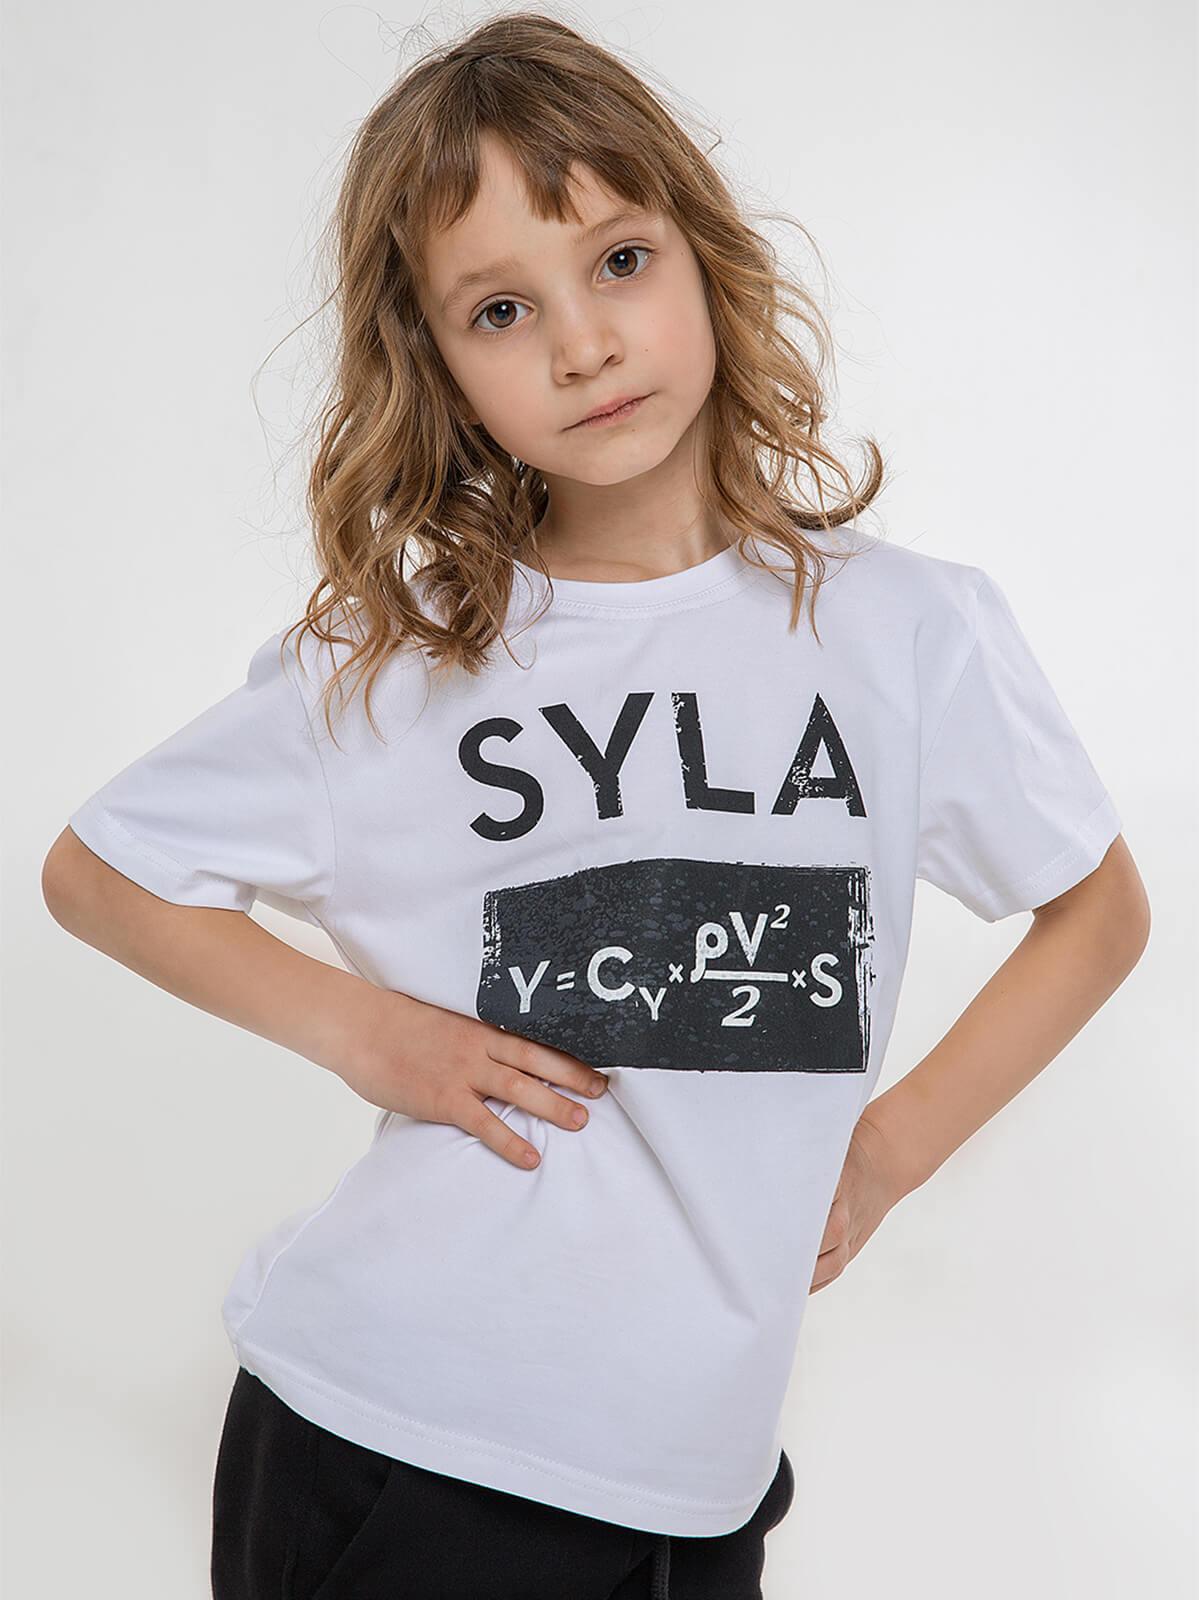 Kids T-Shirt Syla. Color white. Material: 95% cotton, 5% spandex.